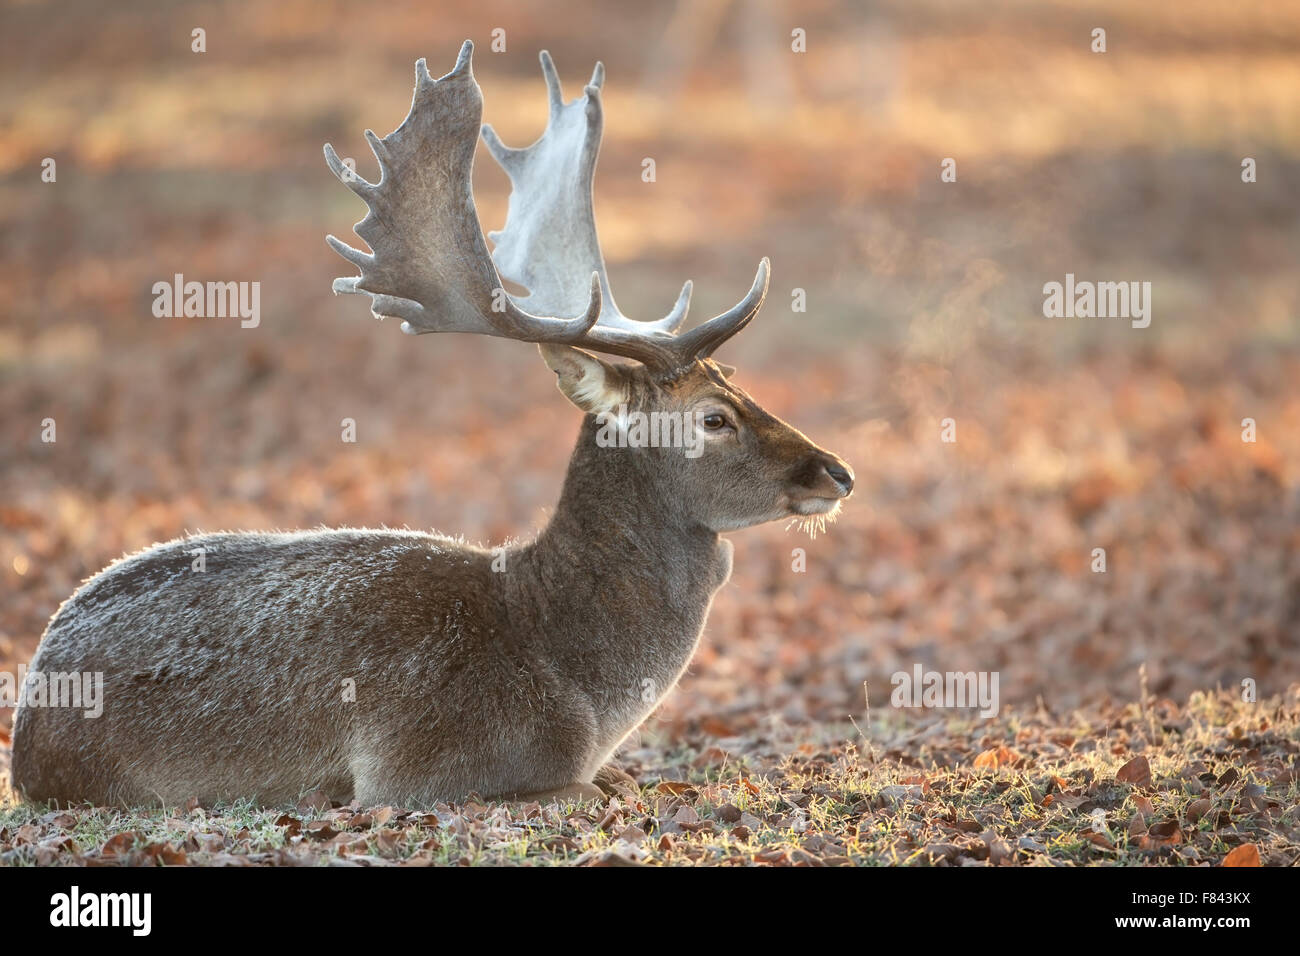 Fallow deer in late autumn - Stock Image